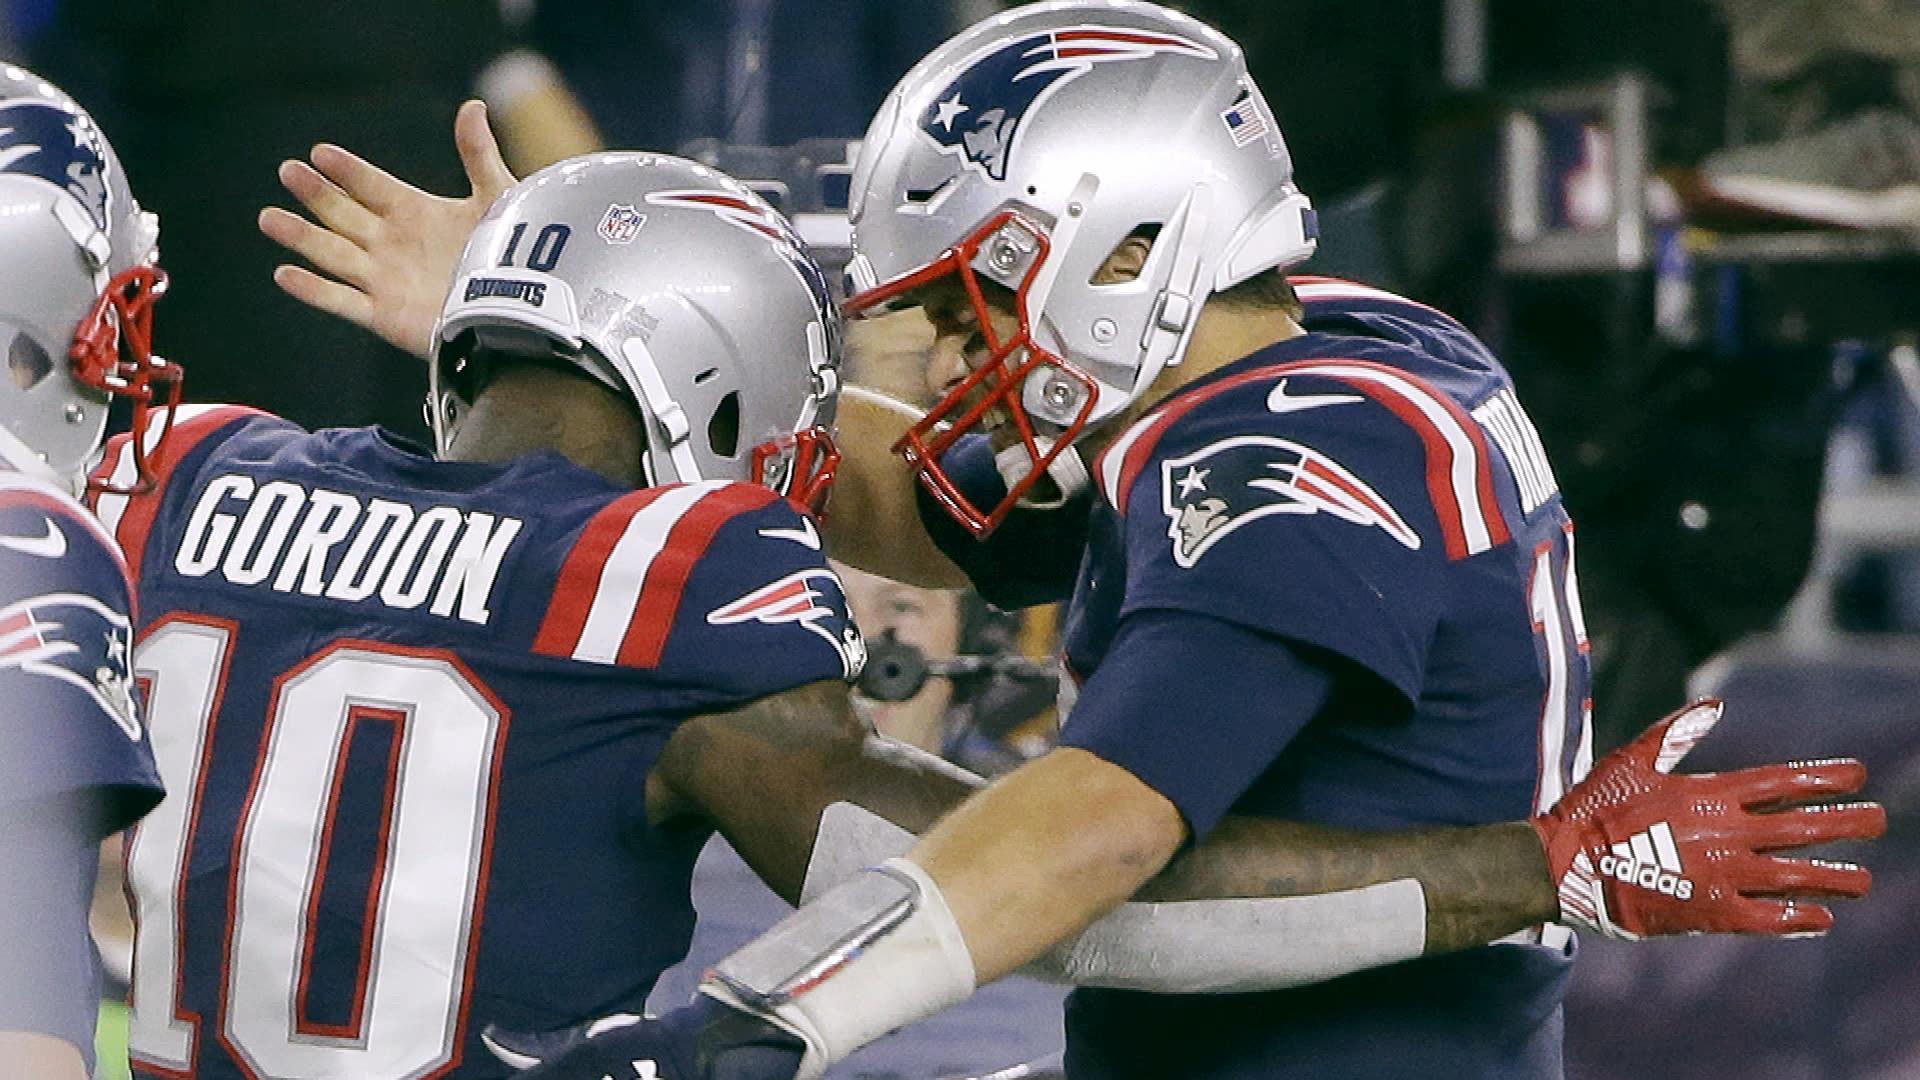 New England Patriots WR Josh Gordon can bring element of 'fun' to team